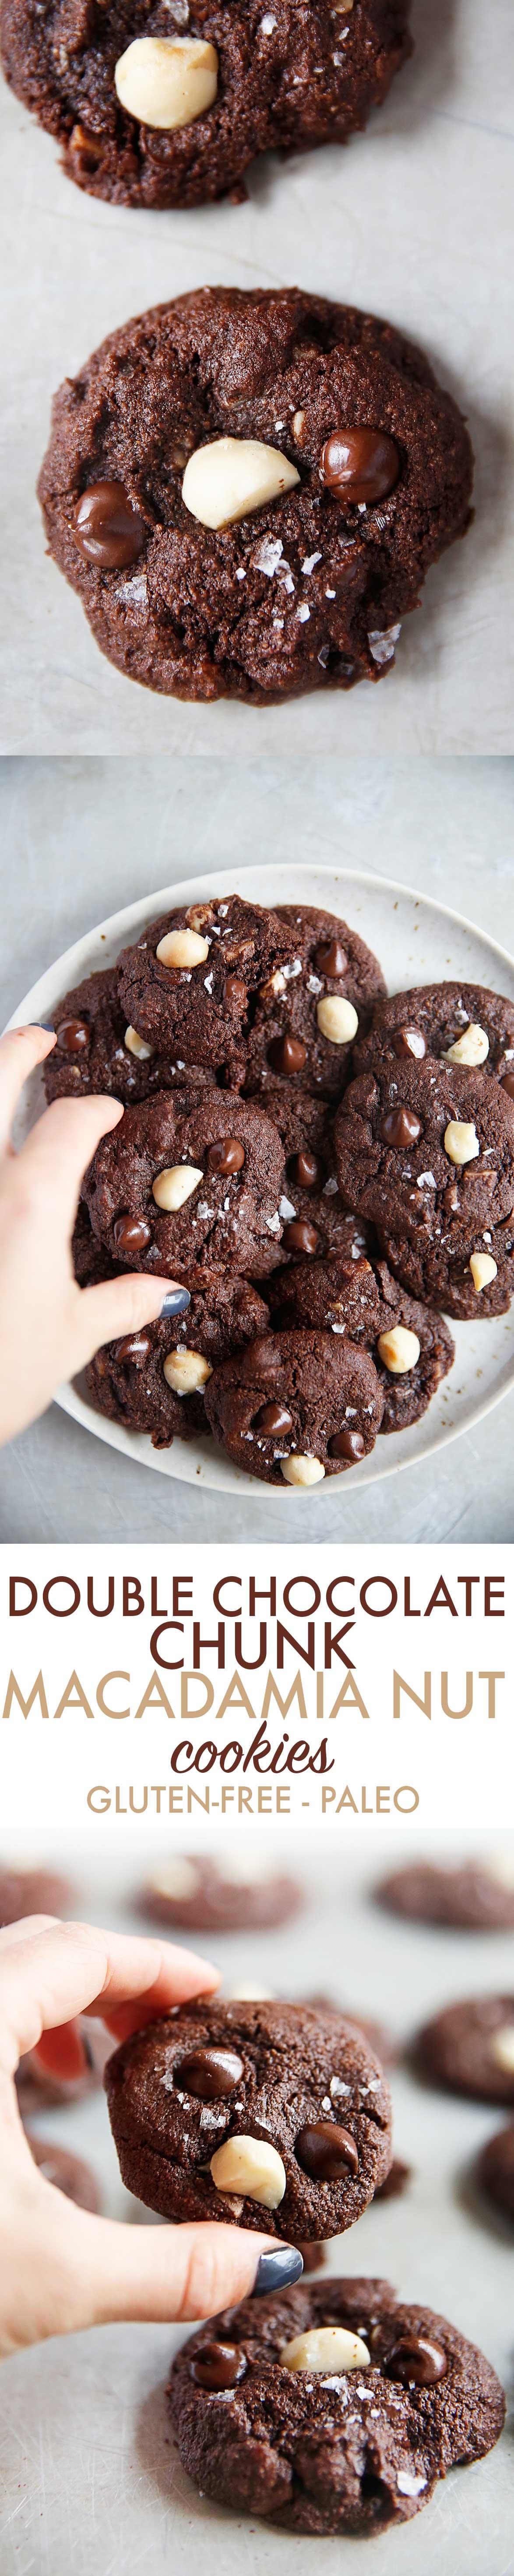 Chocolate Macadamia Nut Cookies {Paleo, dairy-free option}   Lexi's Clean Kitchen